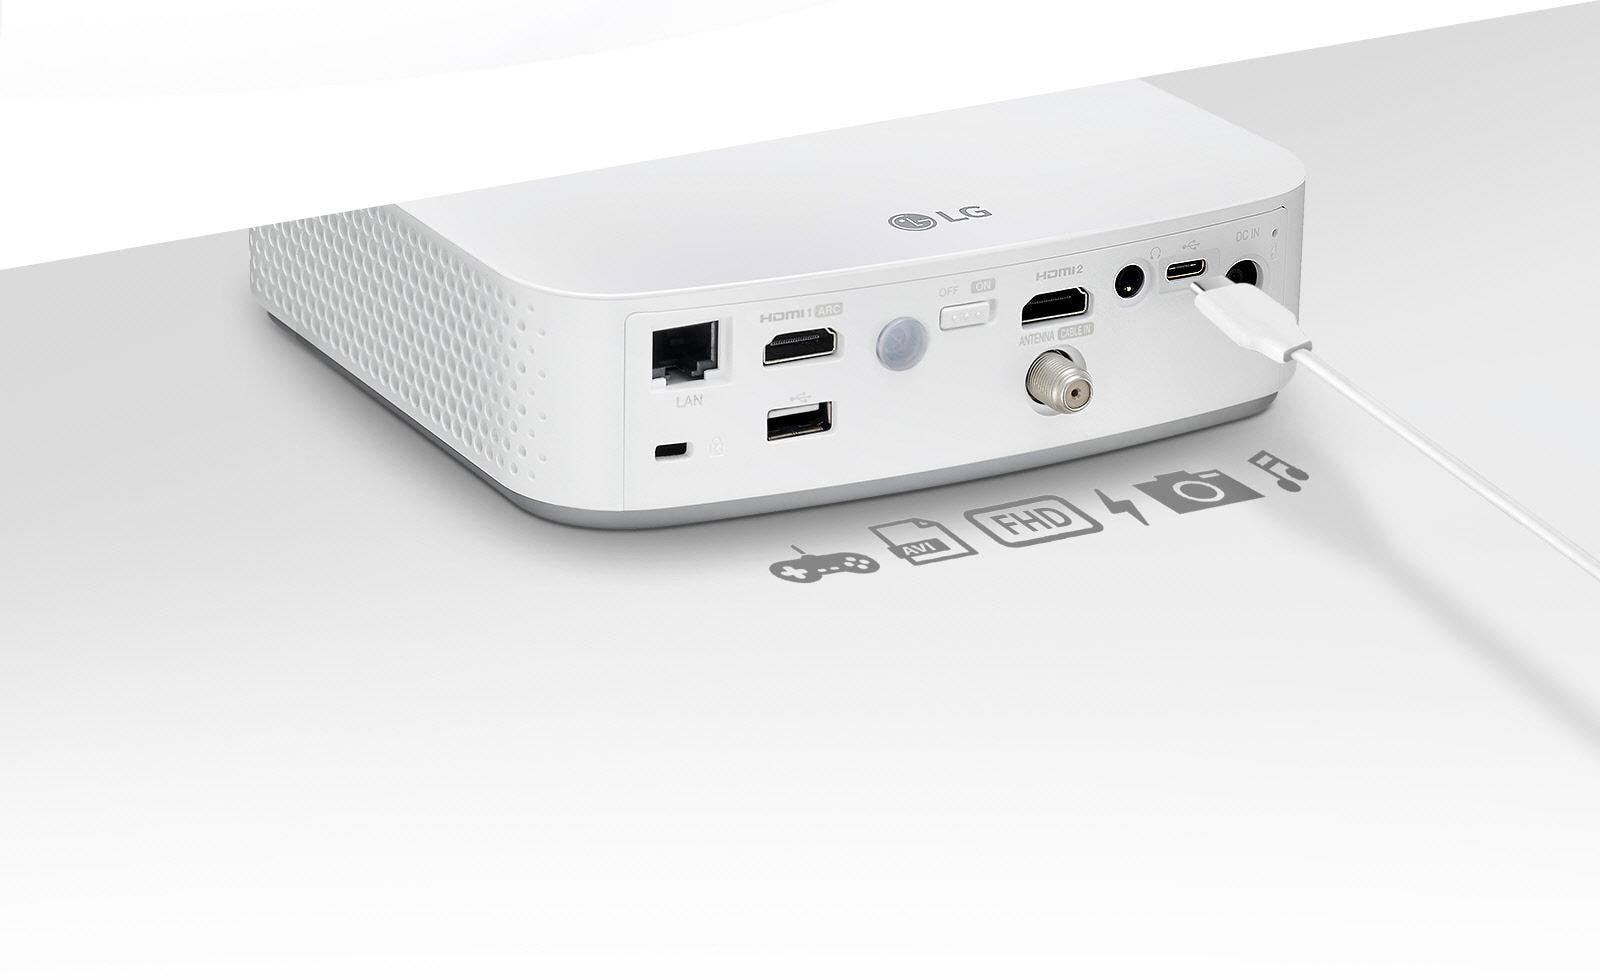 USB Type-C™ Connection